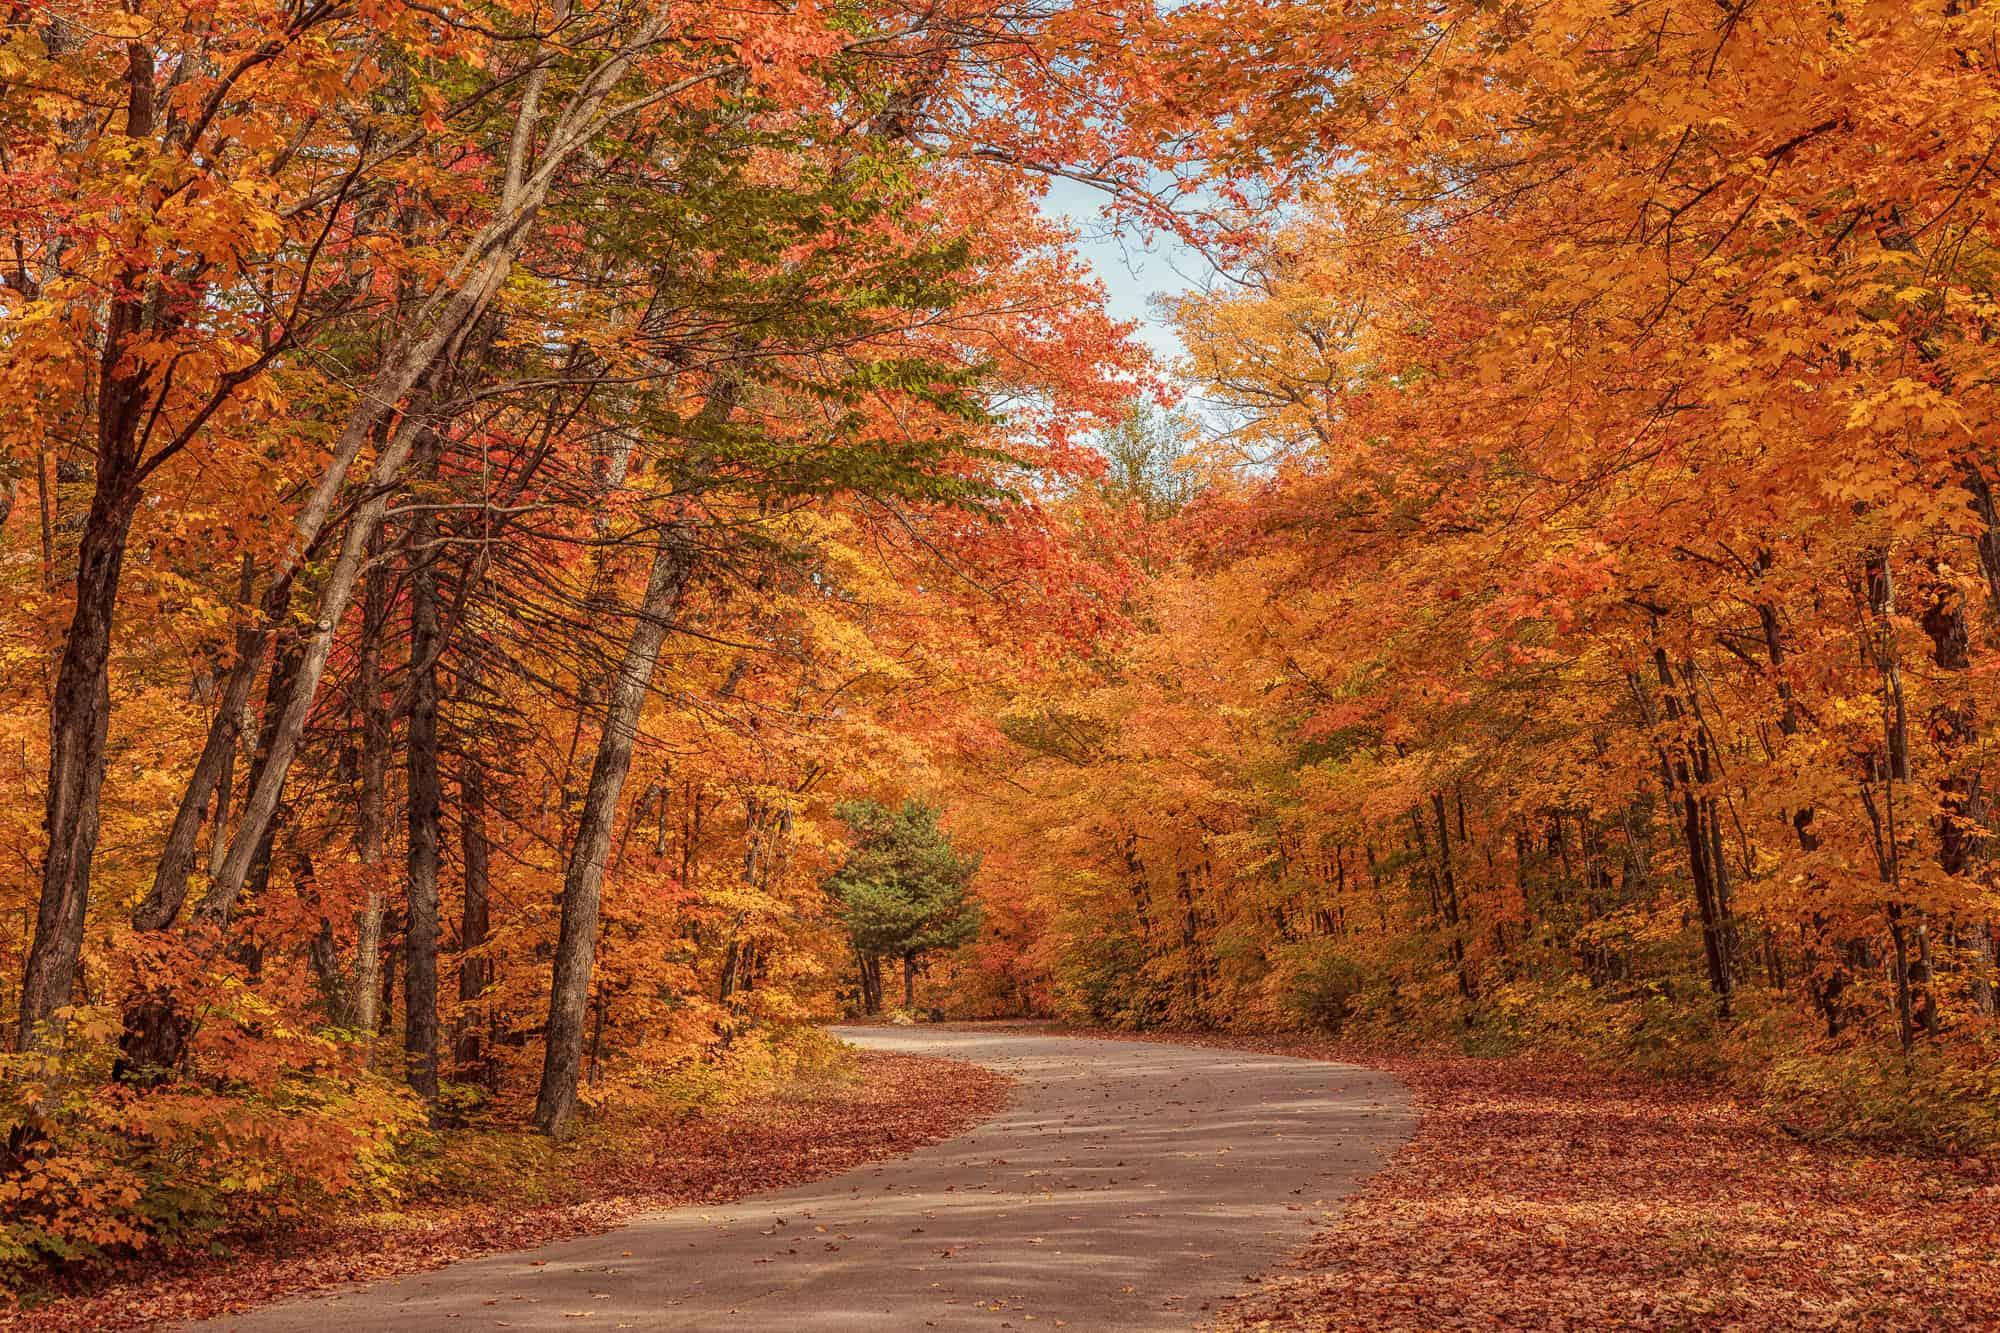 Algonquin Provincial Park: 3 Essential Hikes - Explore ...